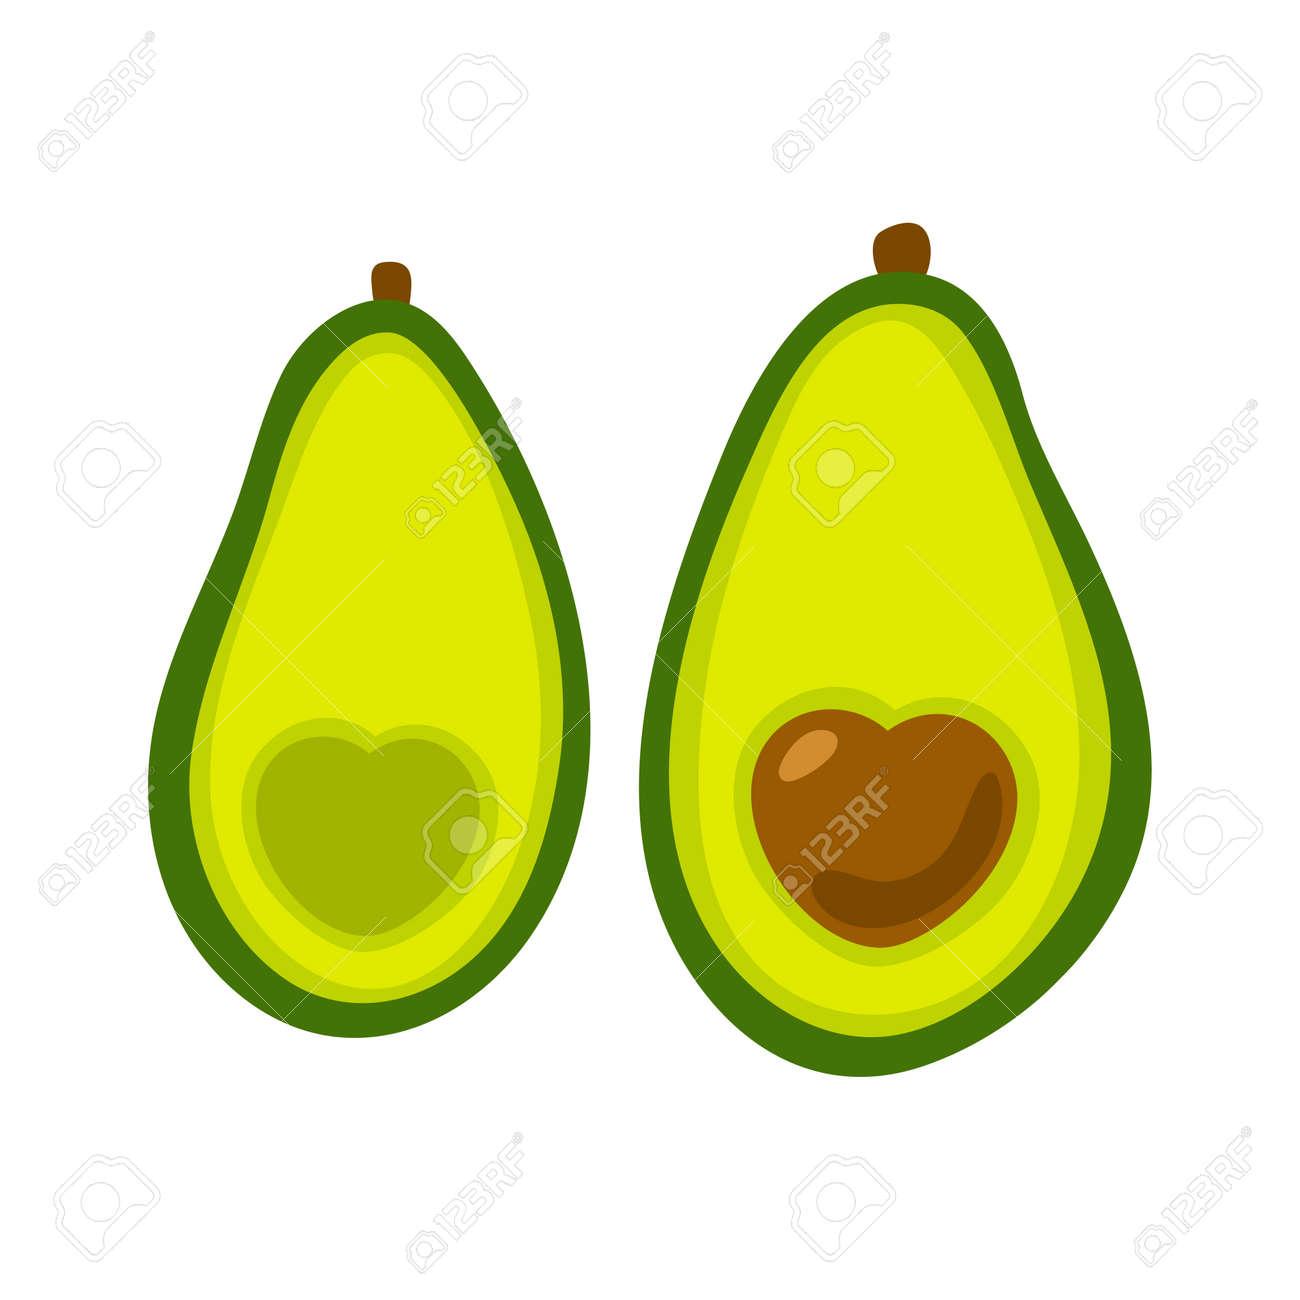 Avocado icon. Flat illustration of avocado vector icon isolated on white background. - 169772069